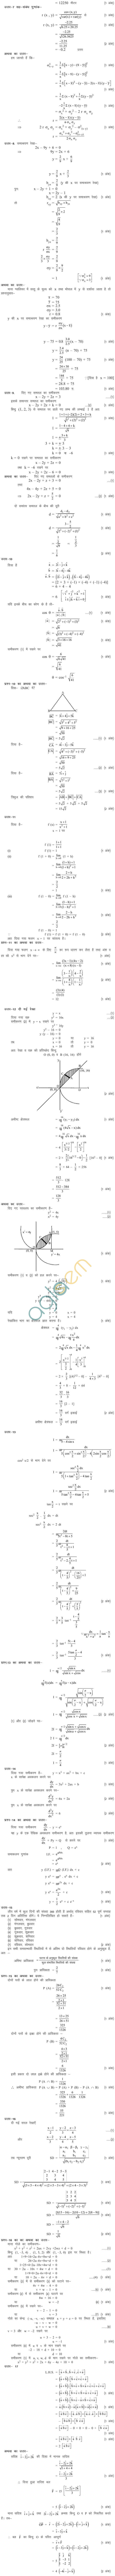 MP BoardClass XII Mathematics Model Questions & Answers -Set 3